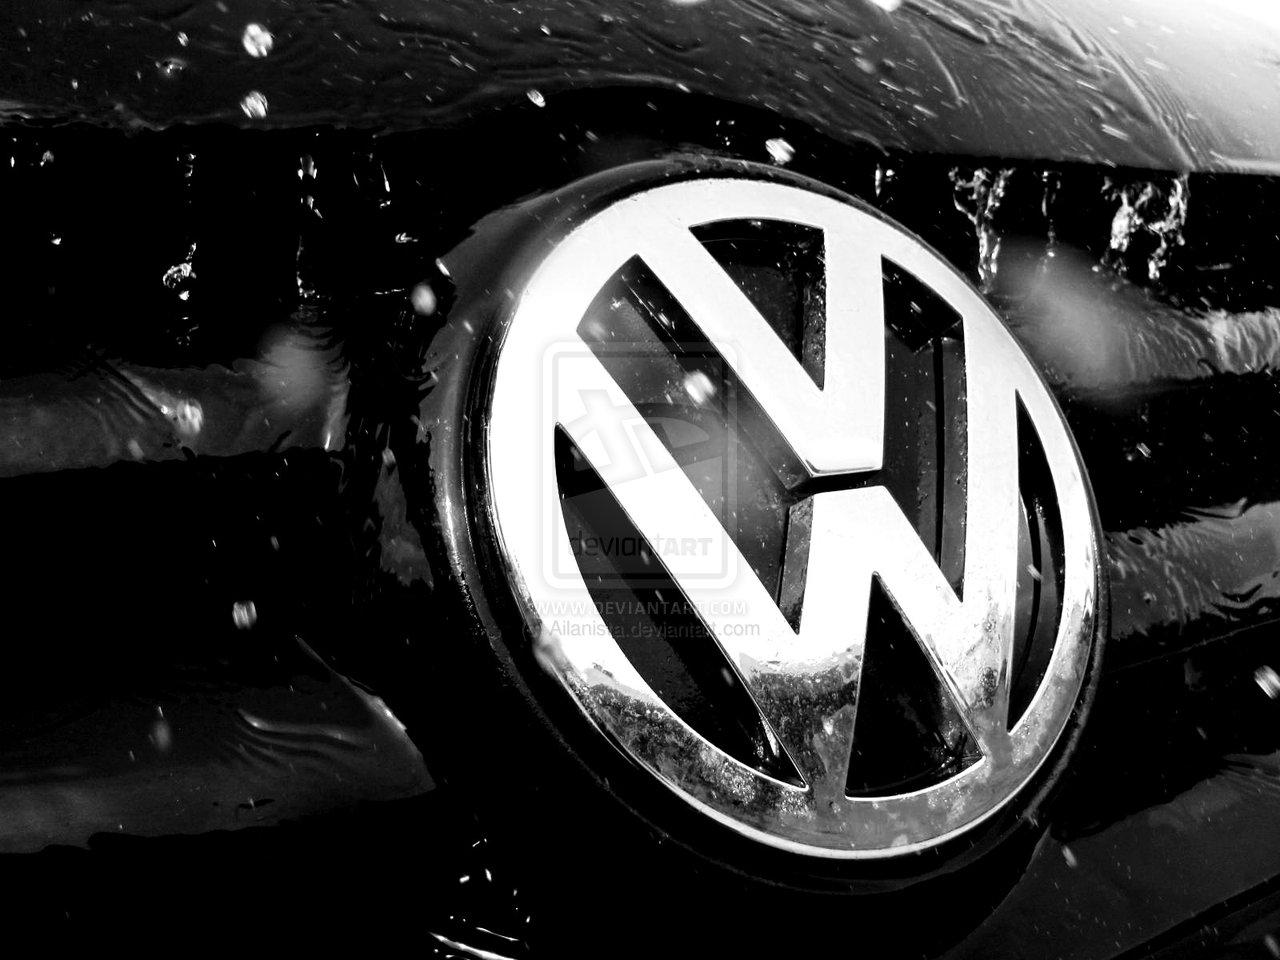 ailanista volkswagen logo c volkswagen add a comment preview 1280x960